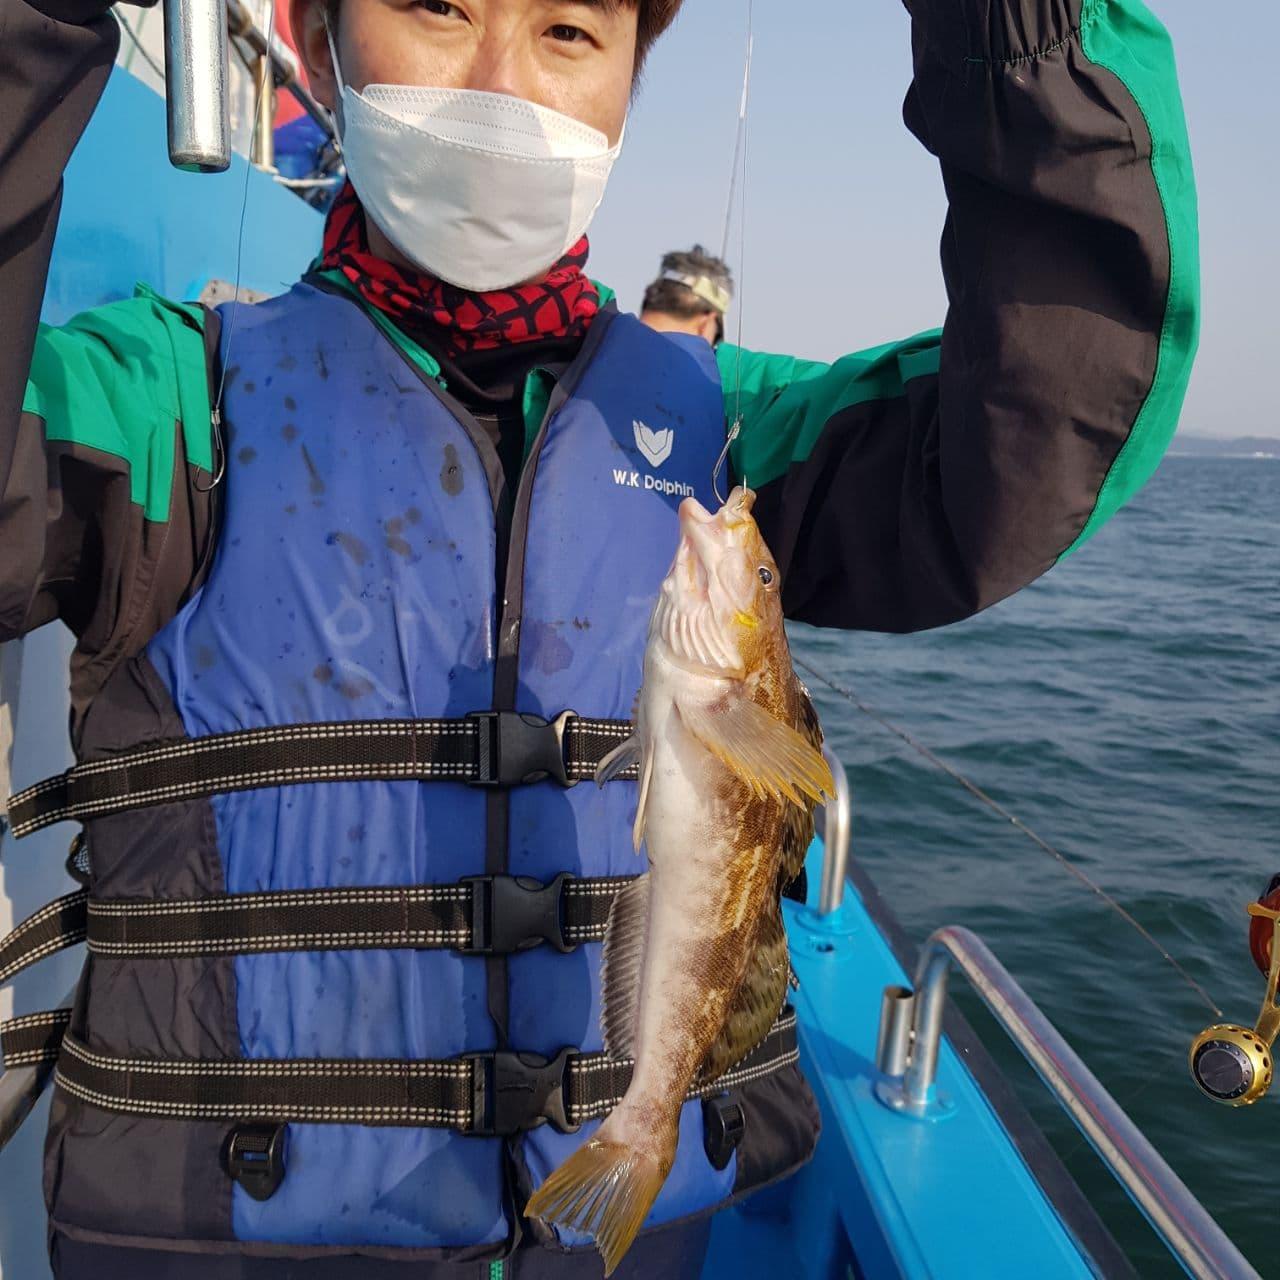 photo_2021-04-10_18-03-12.jpg